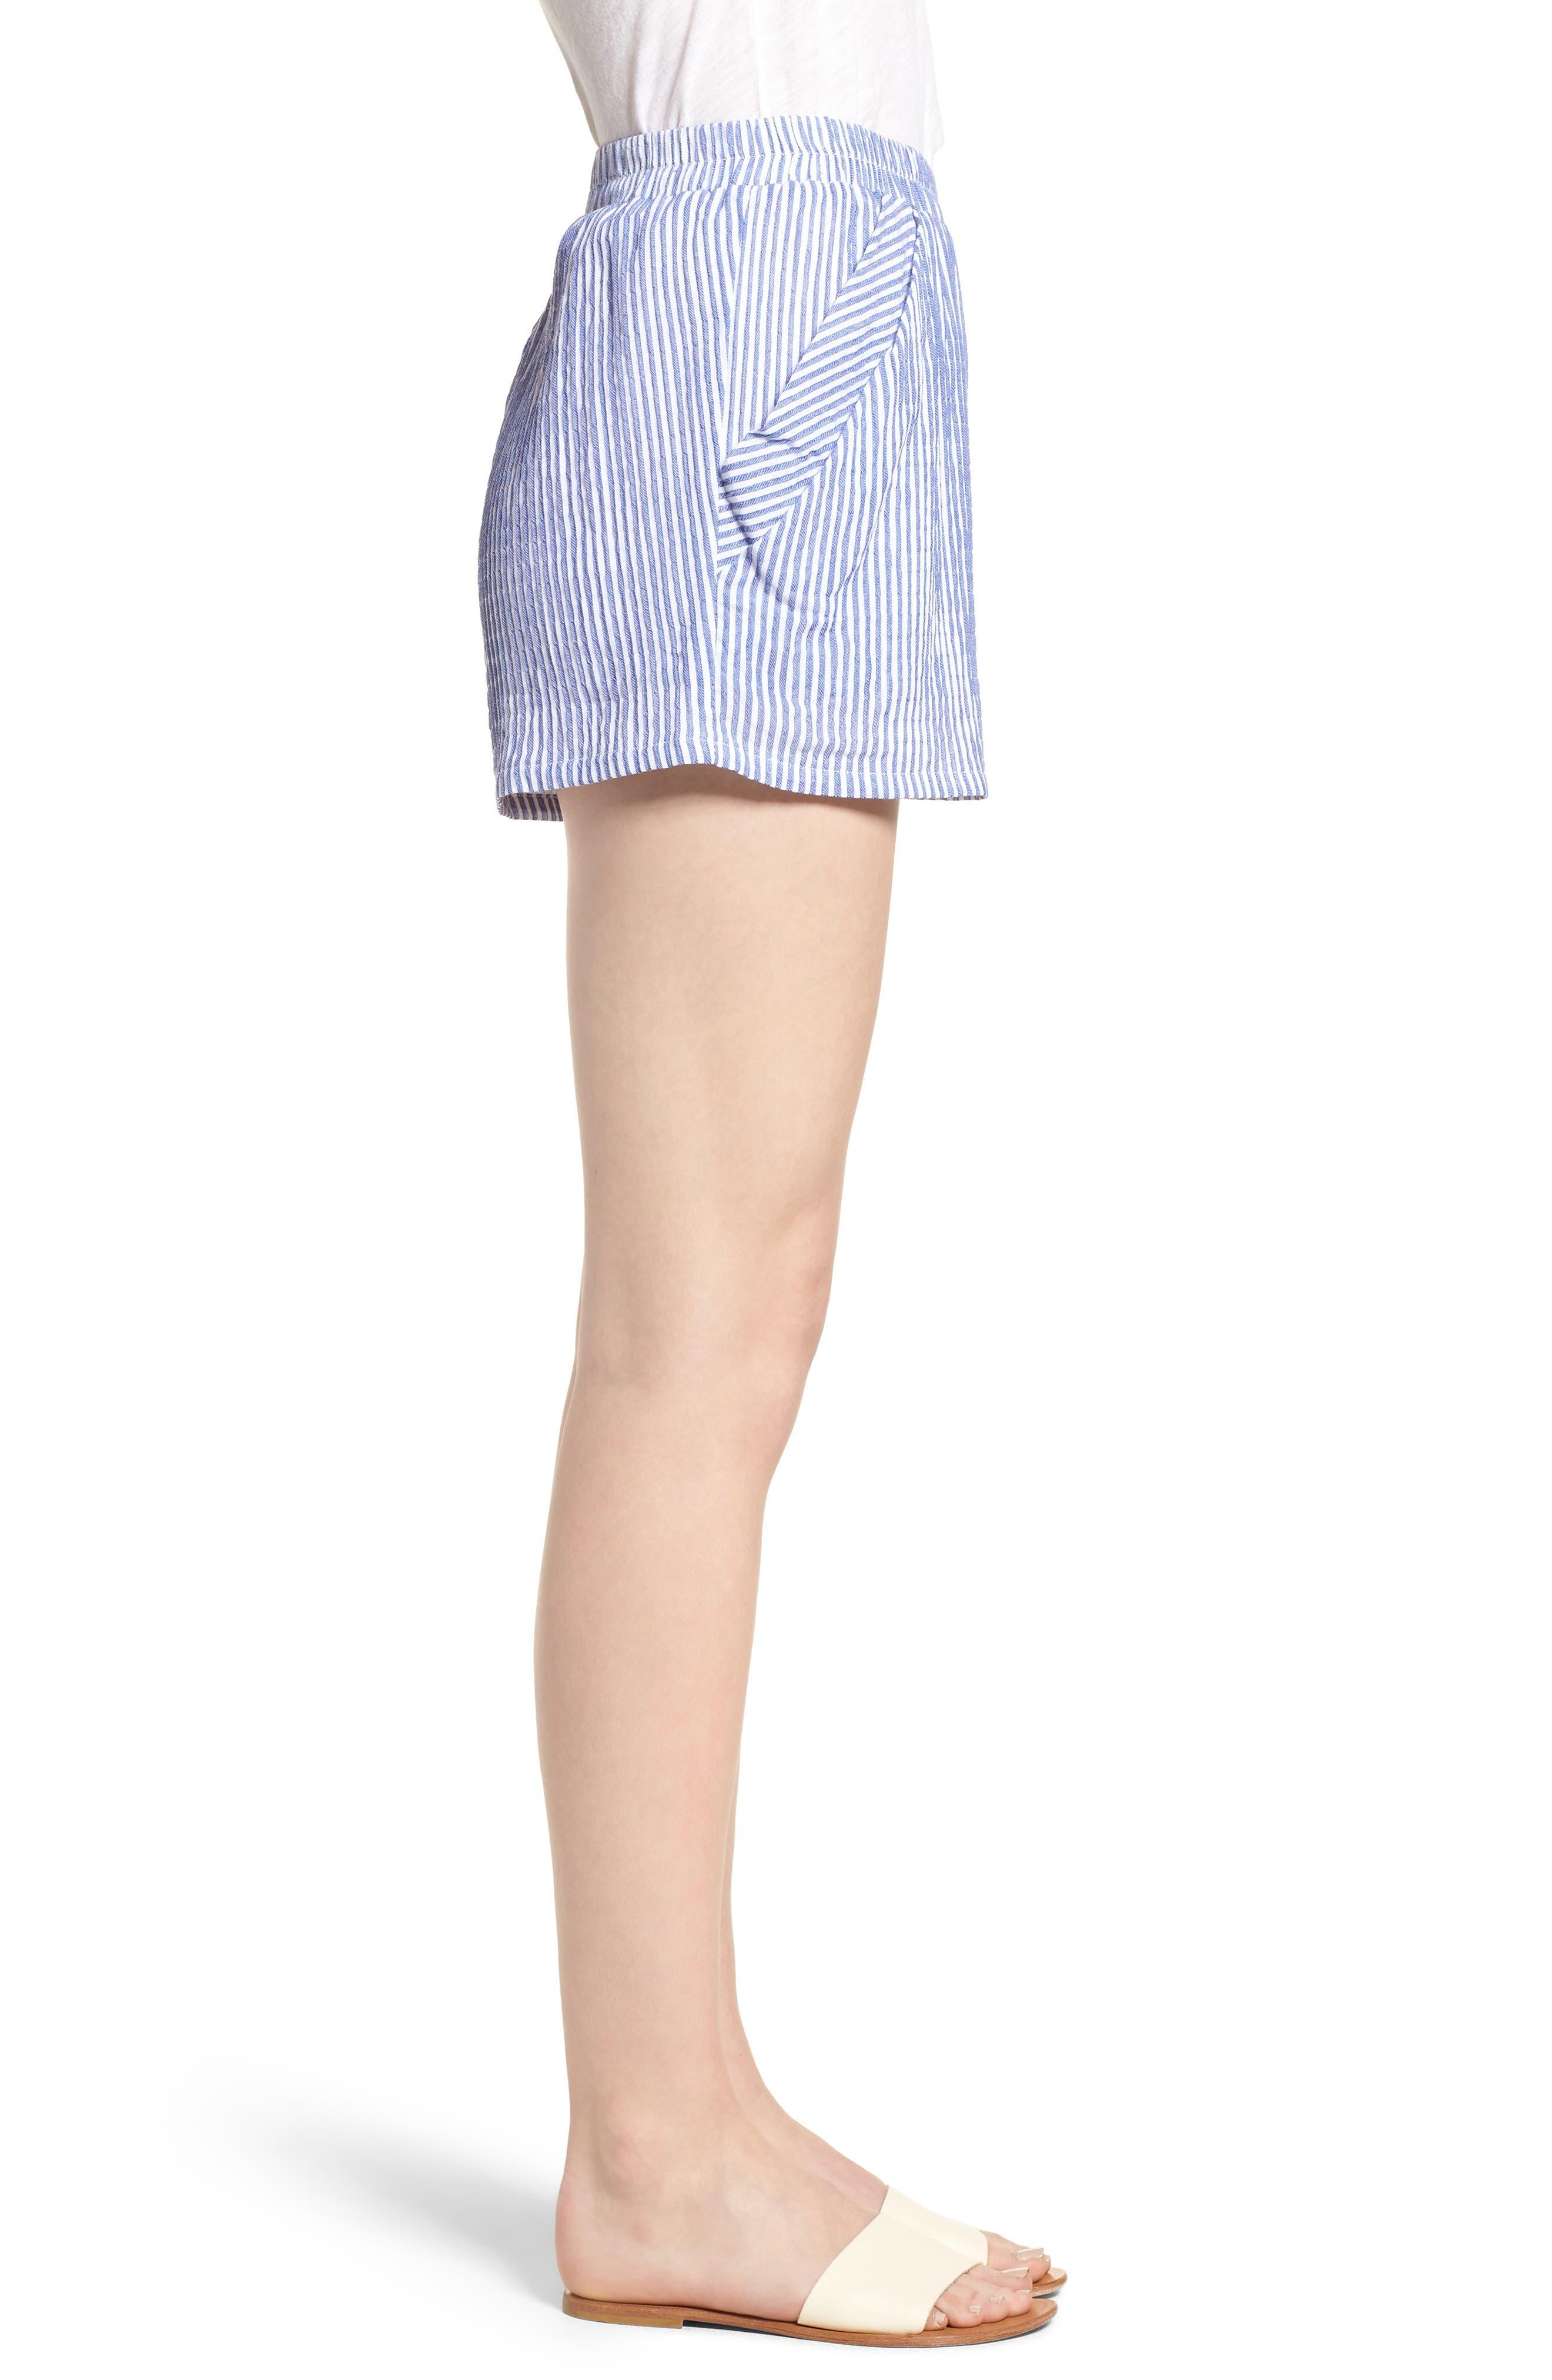 Bishop + Young Stripe Shorts,                             Alternate thumbnail 3, color,                             400